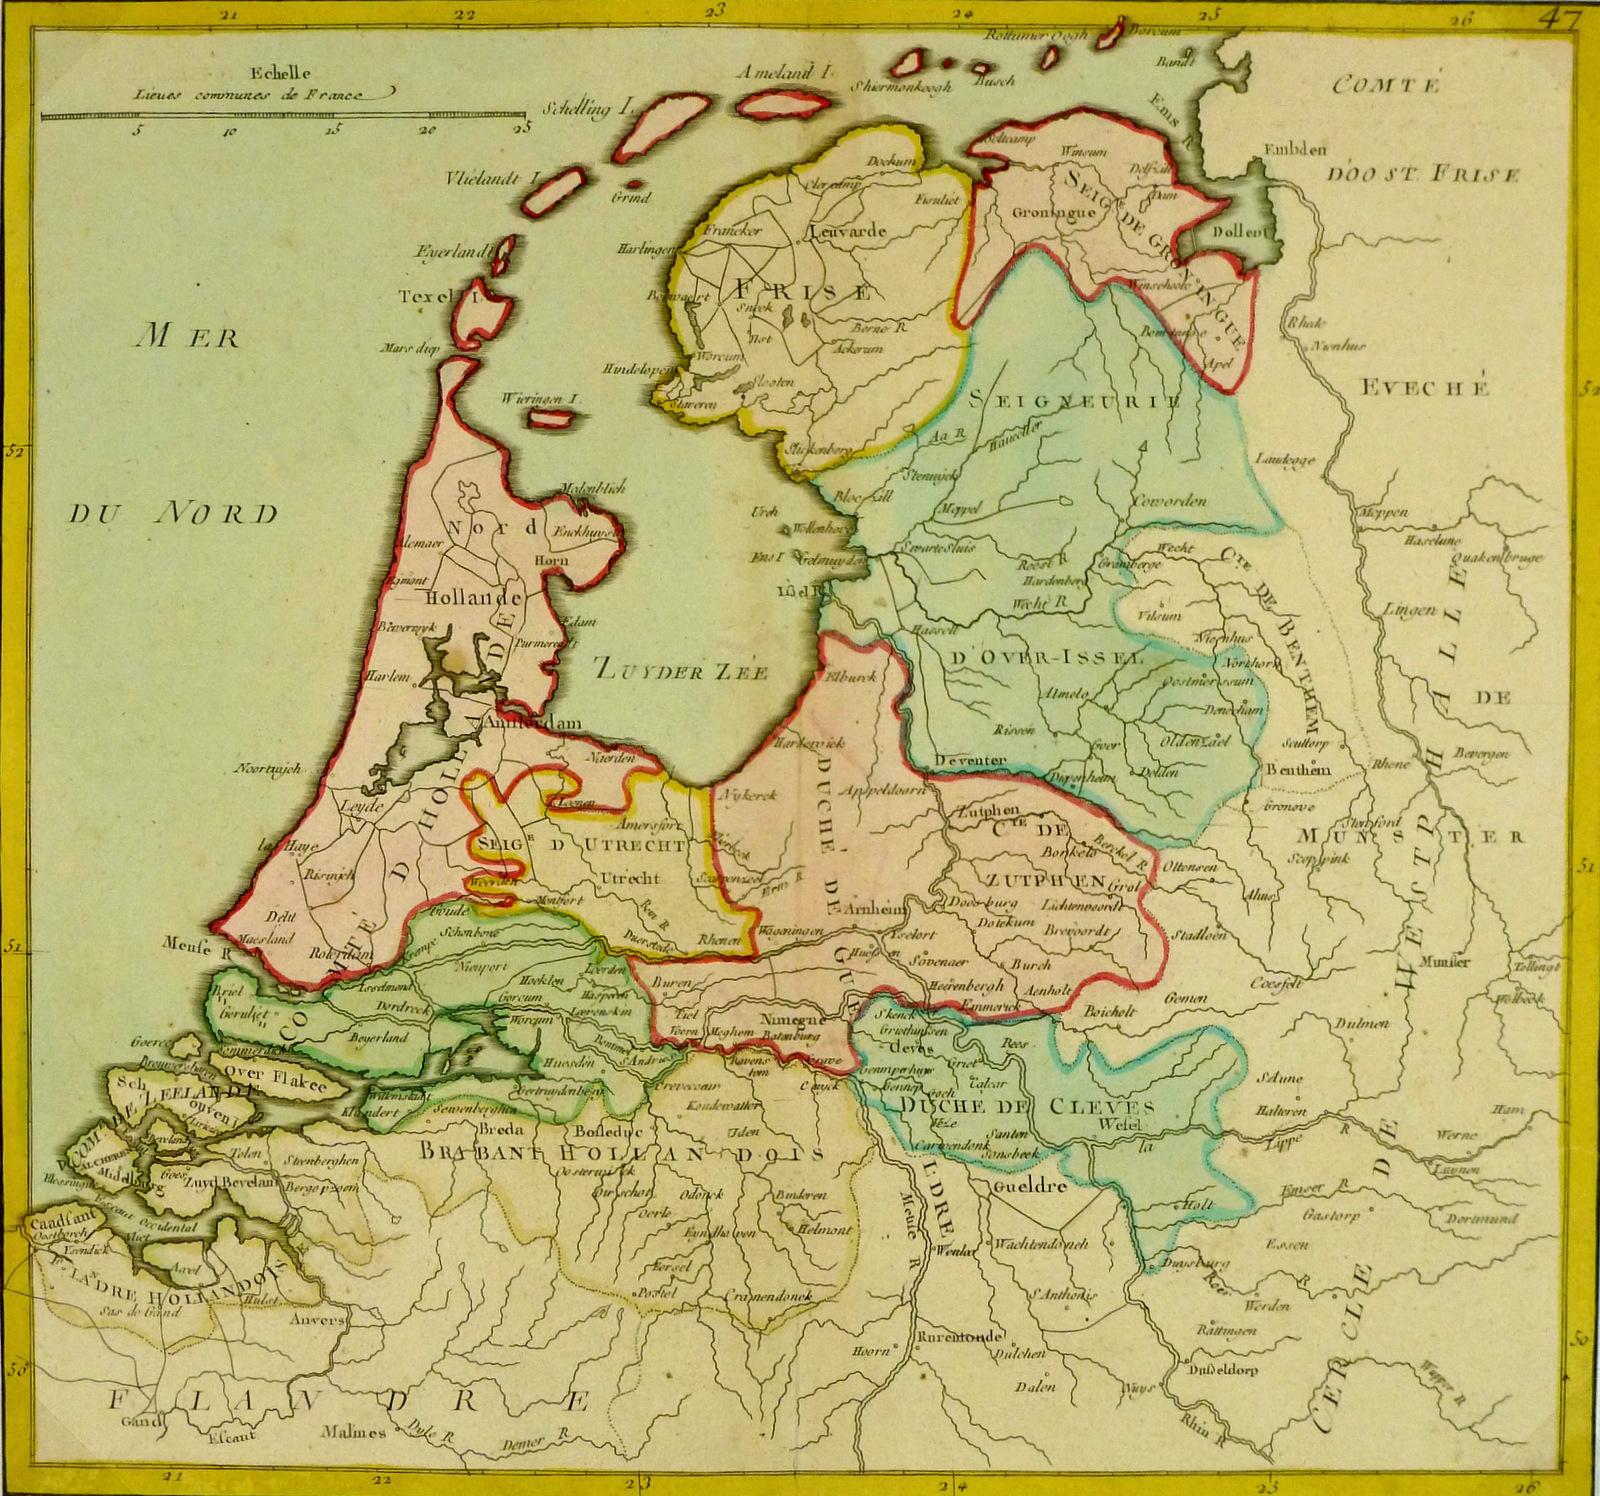 Map of Holland, 1767-main-8118K